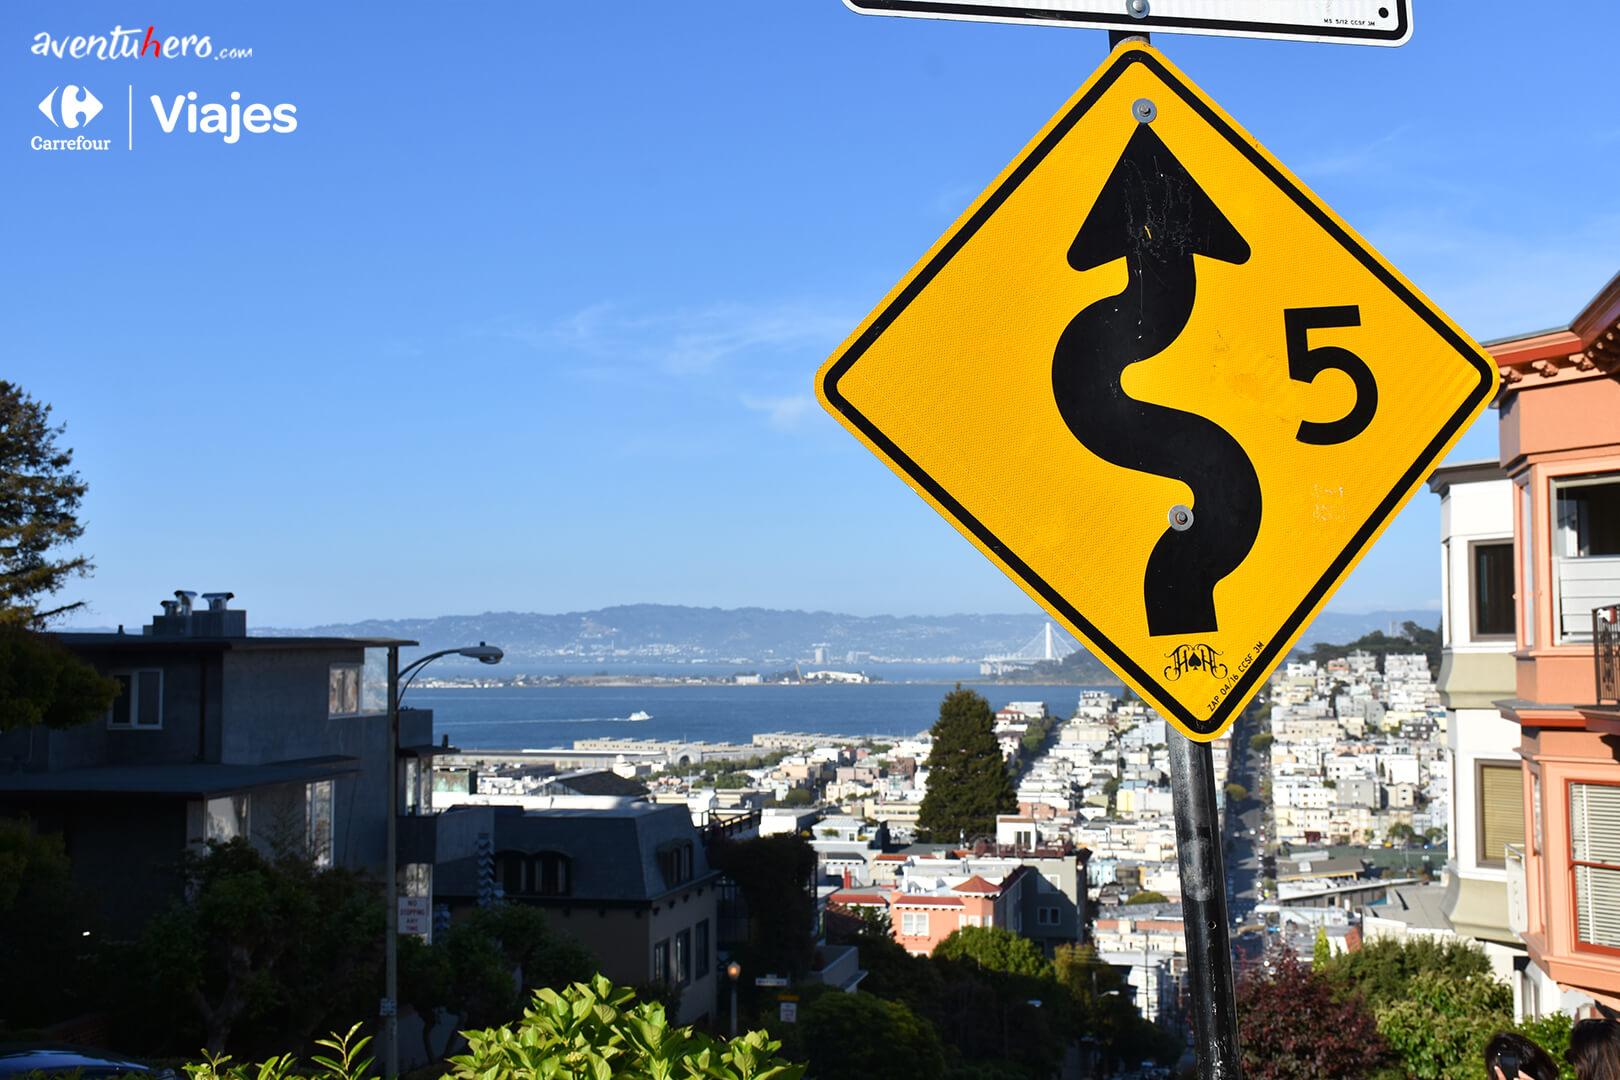 Carretera sinuosa San Francisco